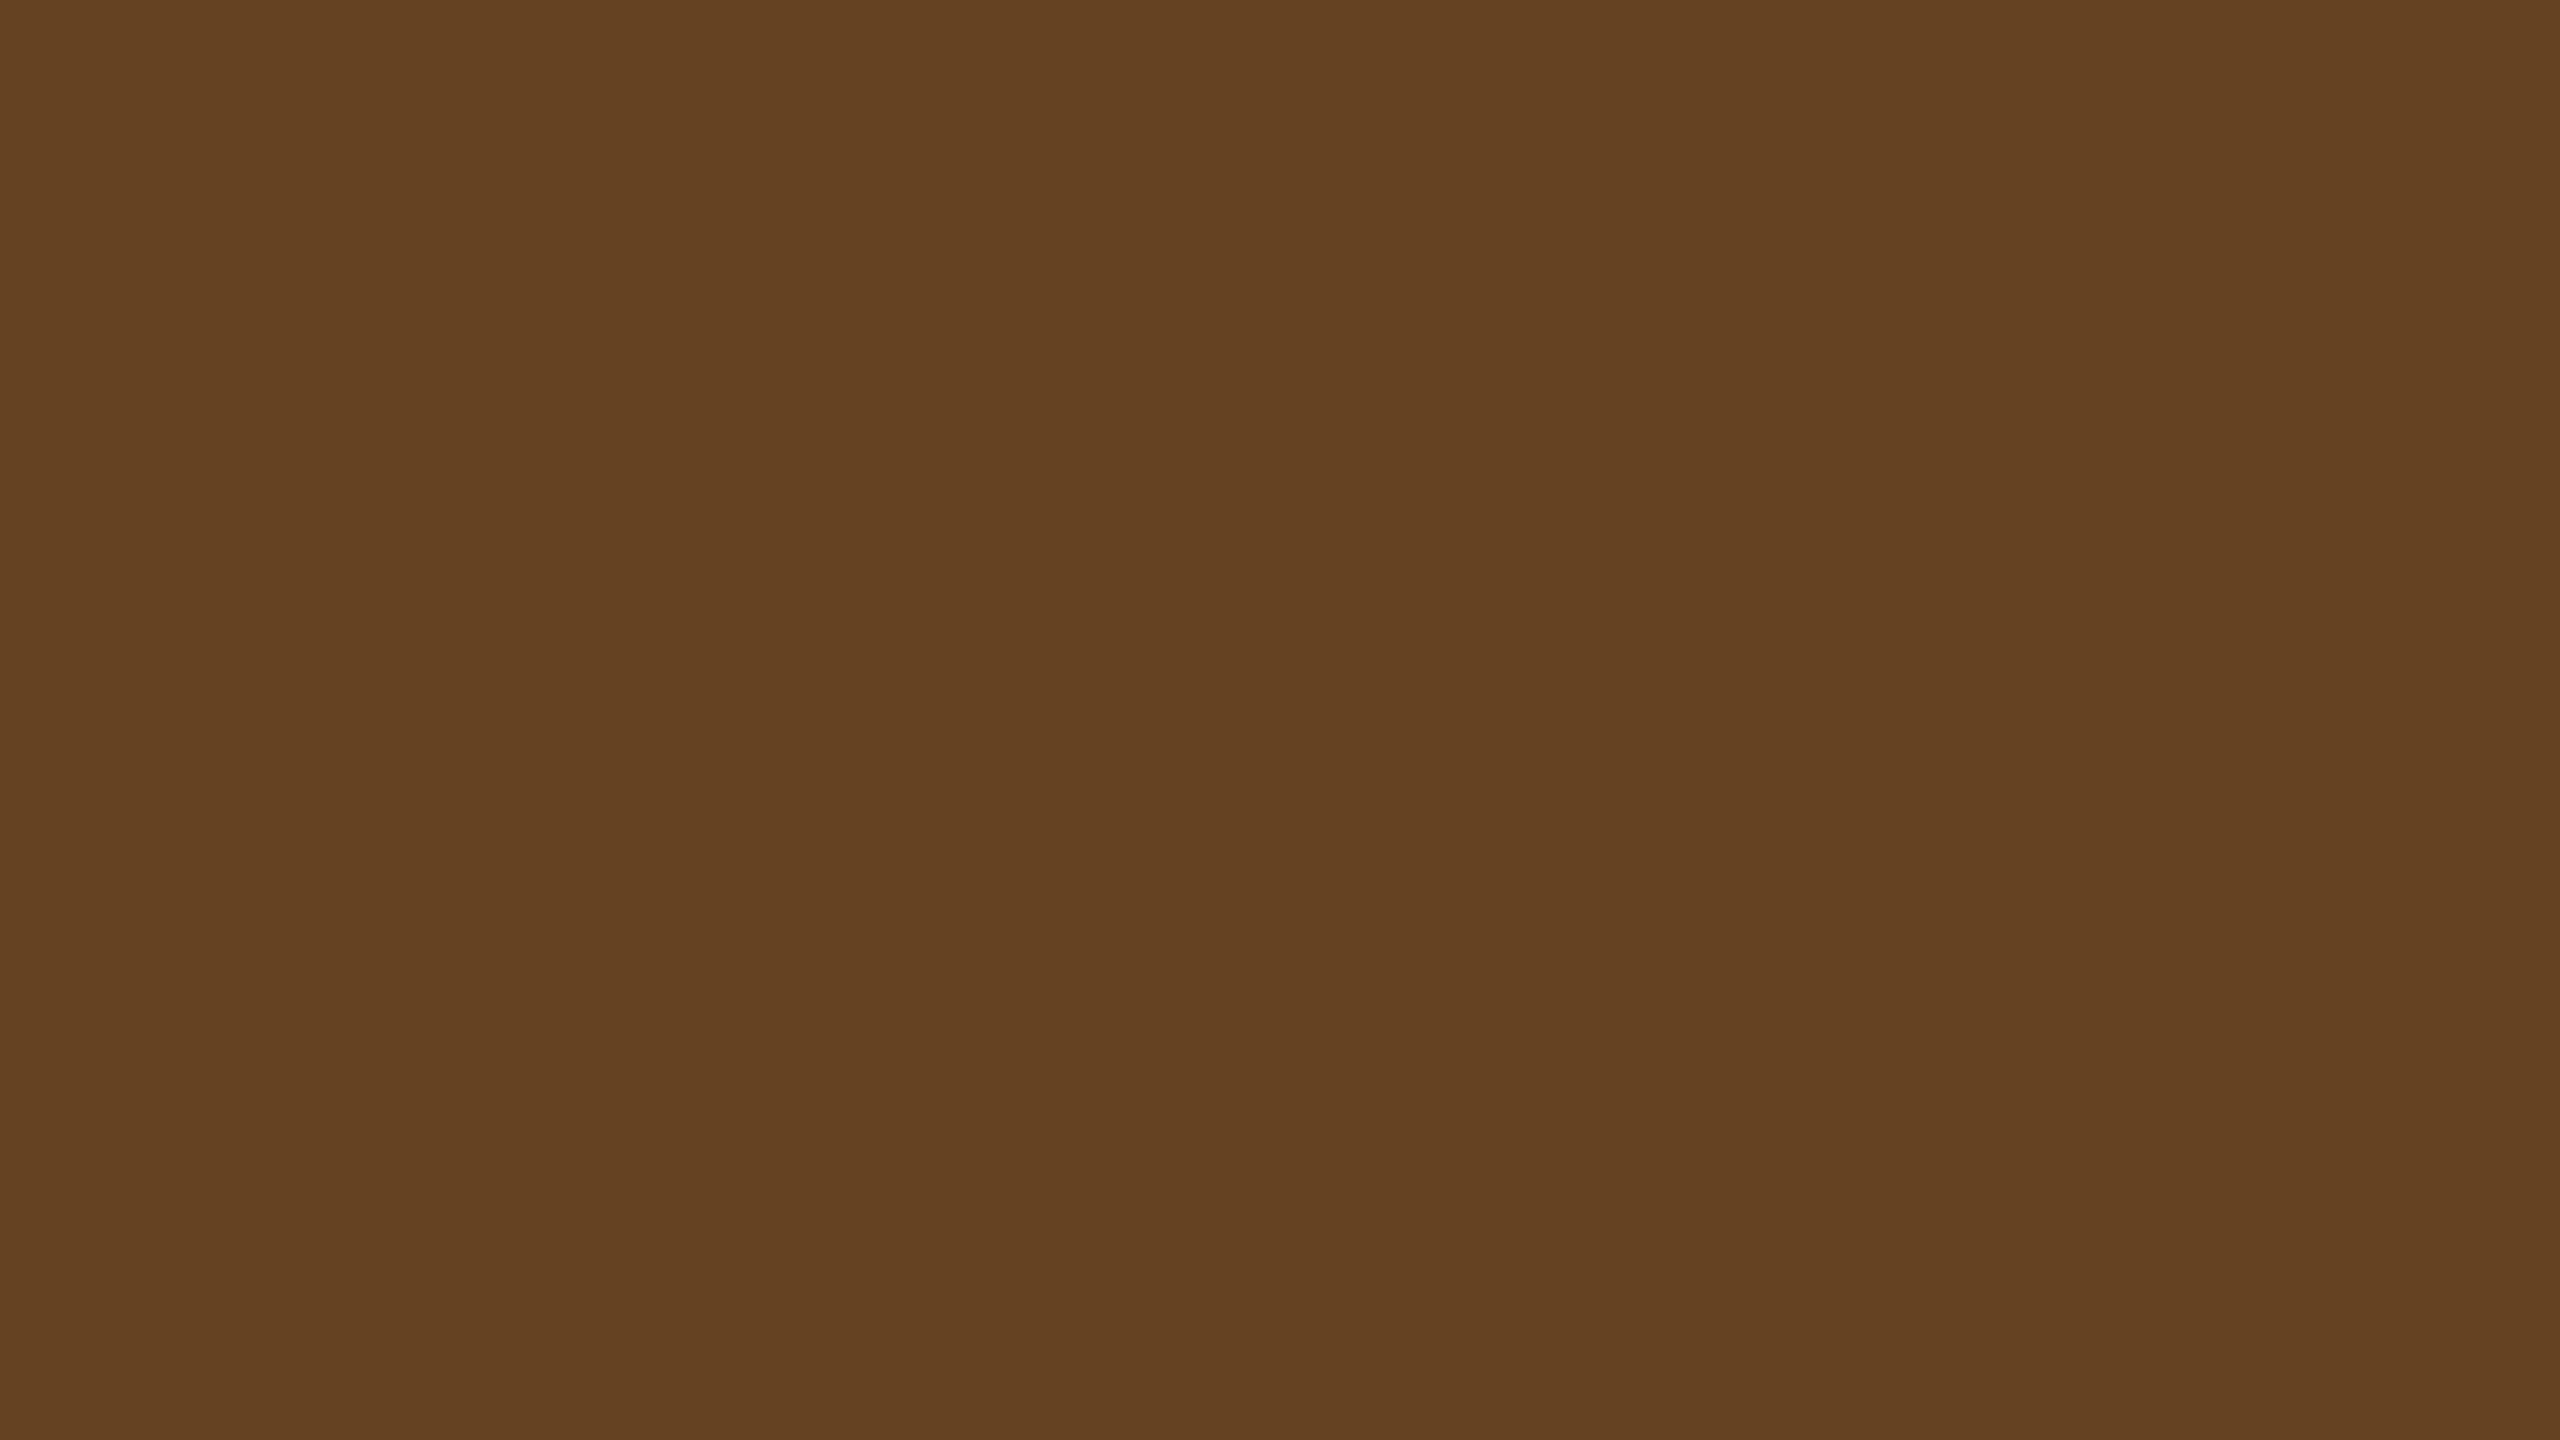 Solid Brown Wallpaper